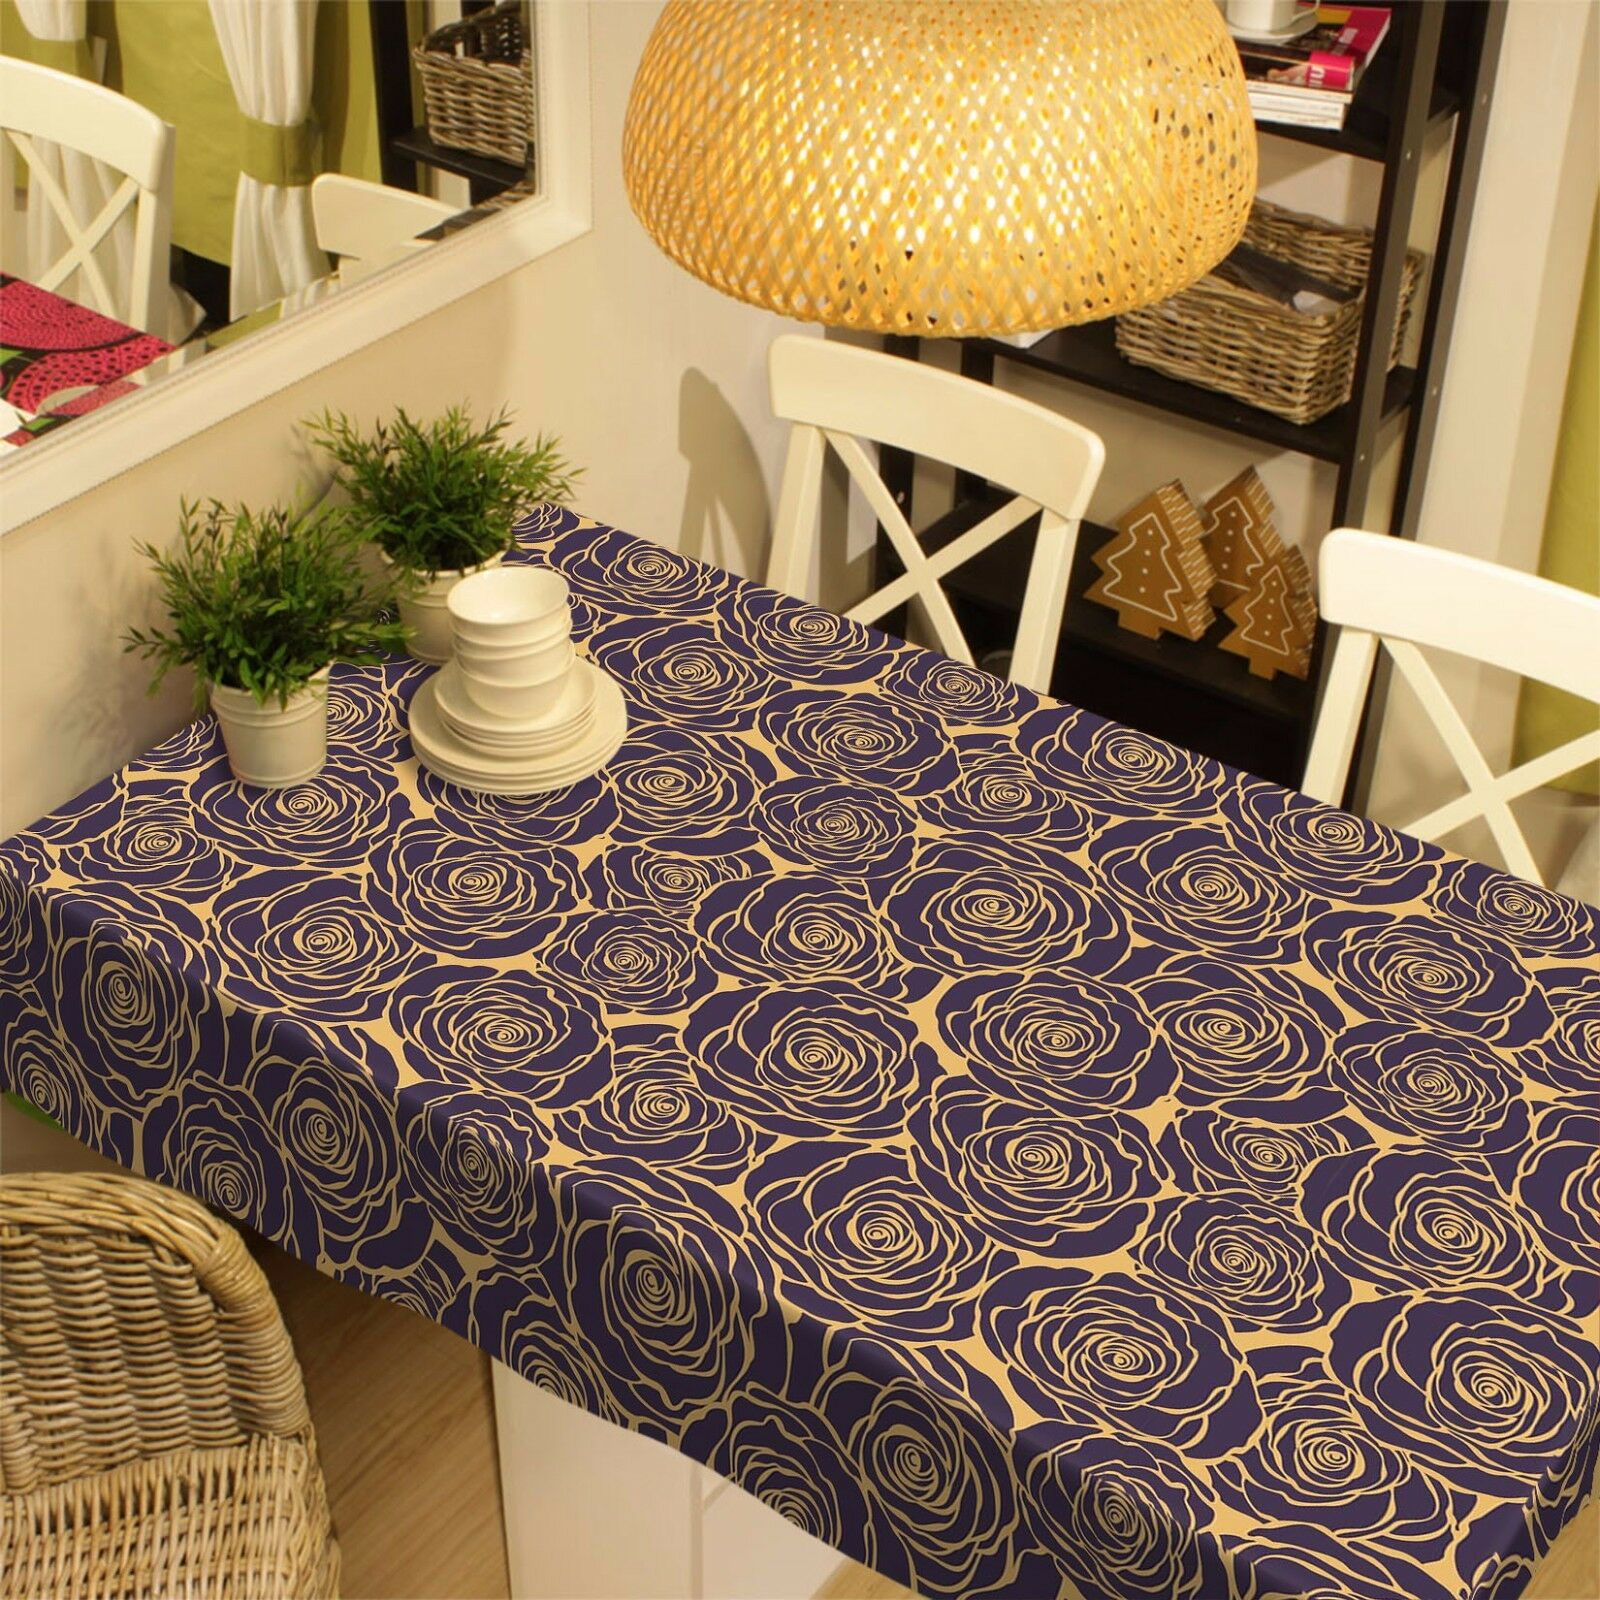 3D Petal  4379 Tablecloth Table Cover Cloth Birthday Party Event AJ WALLPAPER AU